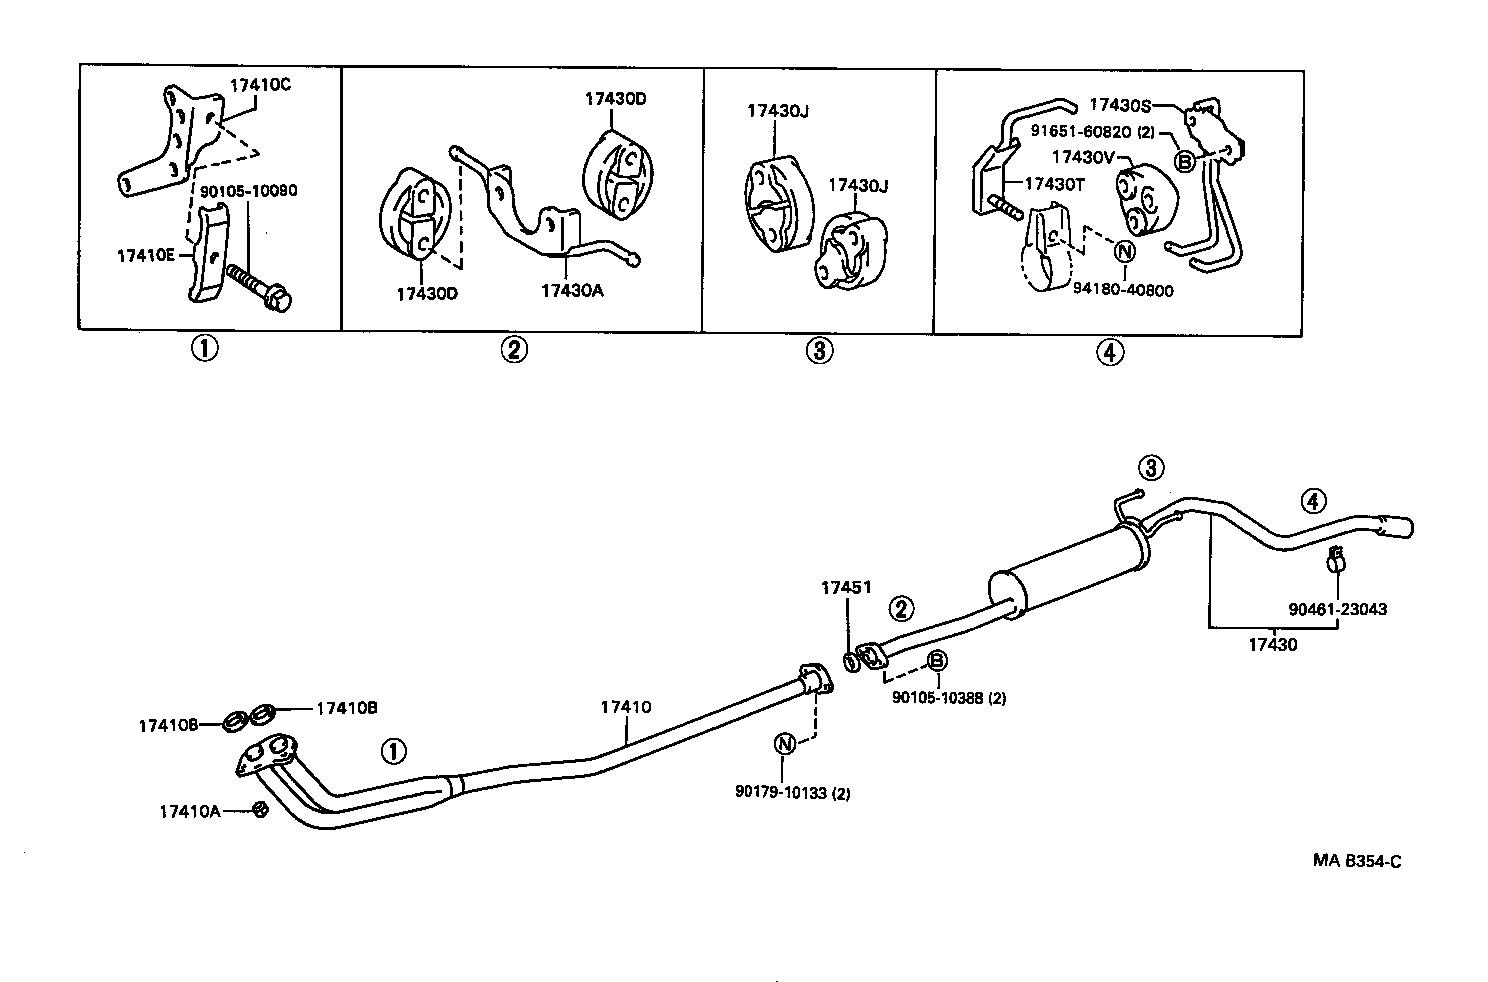 1985 Toyota Cressida Engine Diagram. Toyota. Auto Wiring